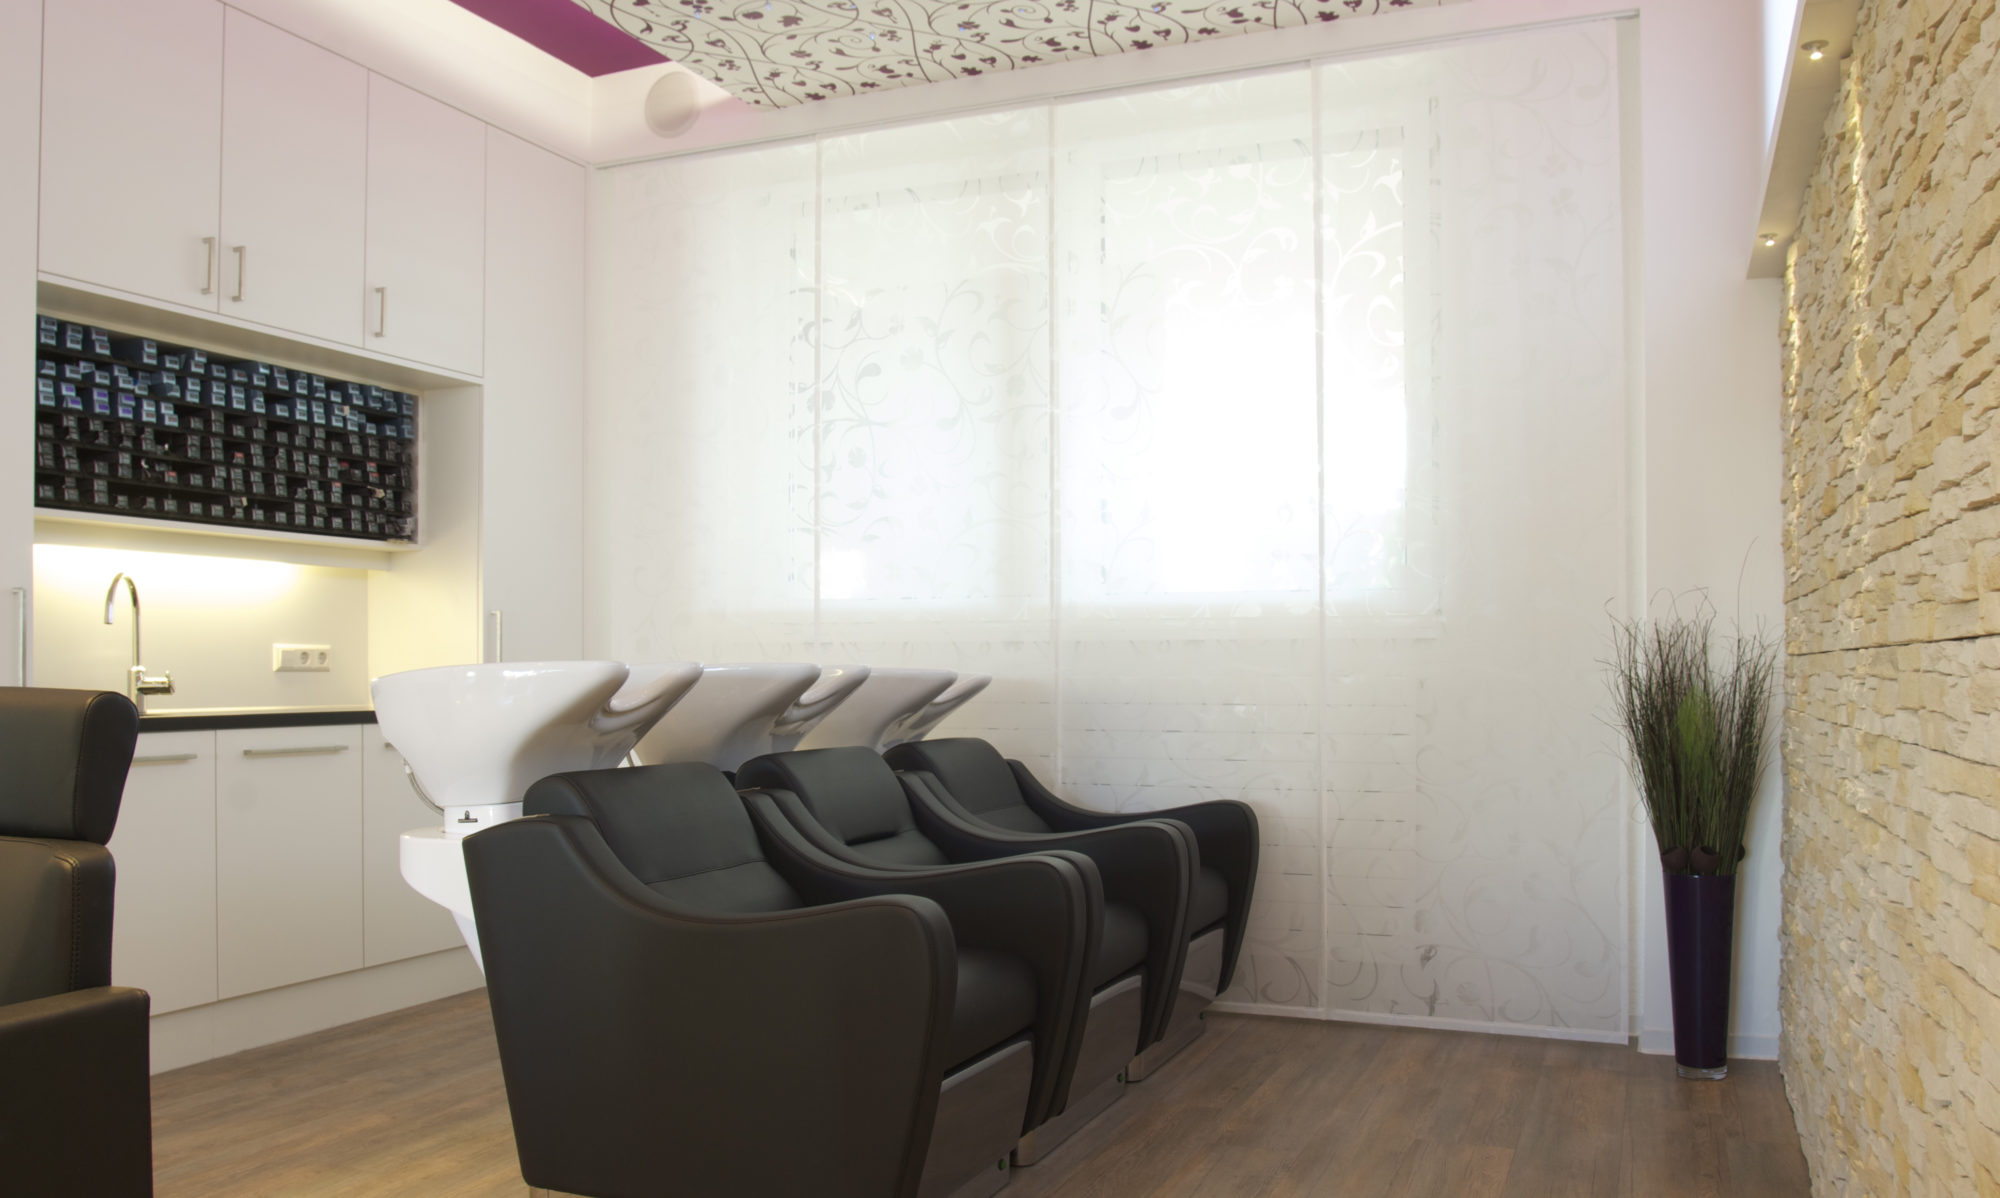 Salon Erhardt Tel.07323.7228